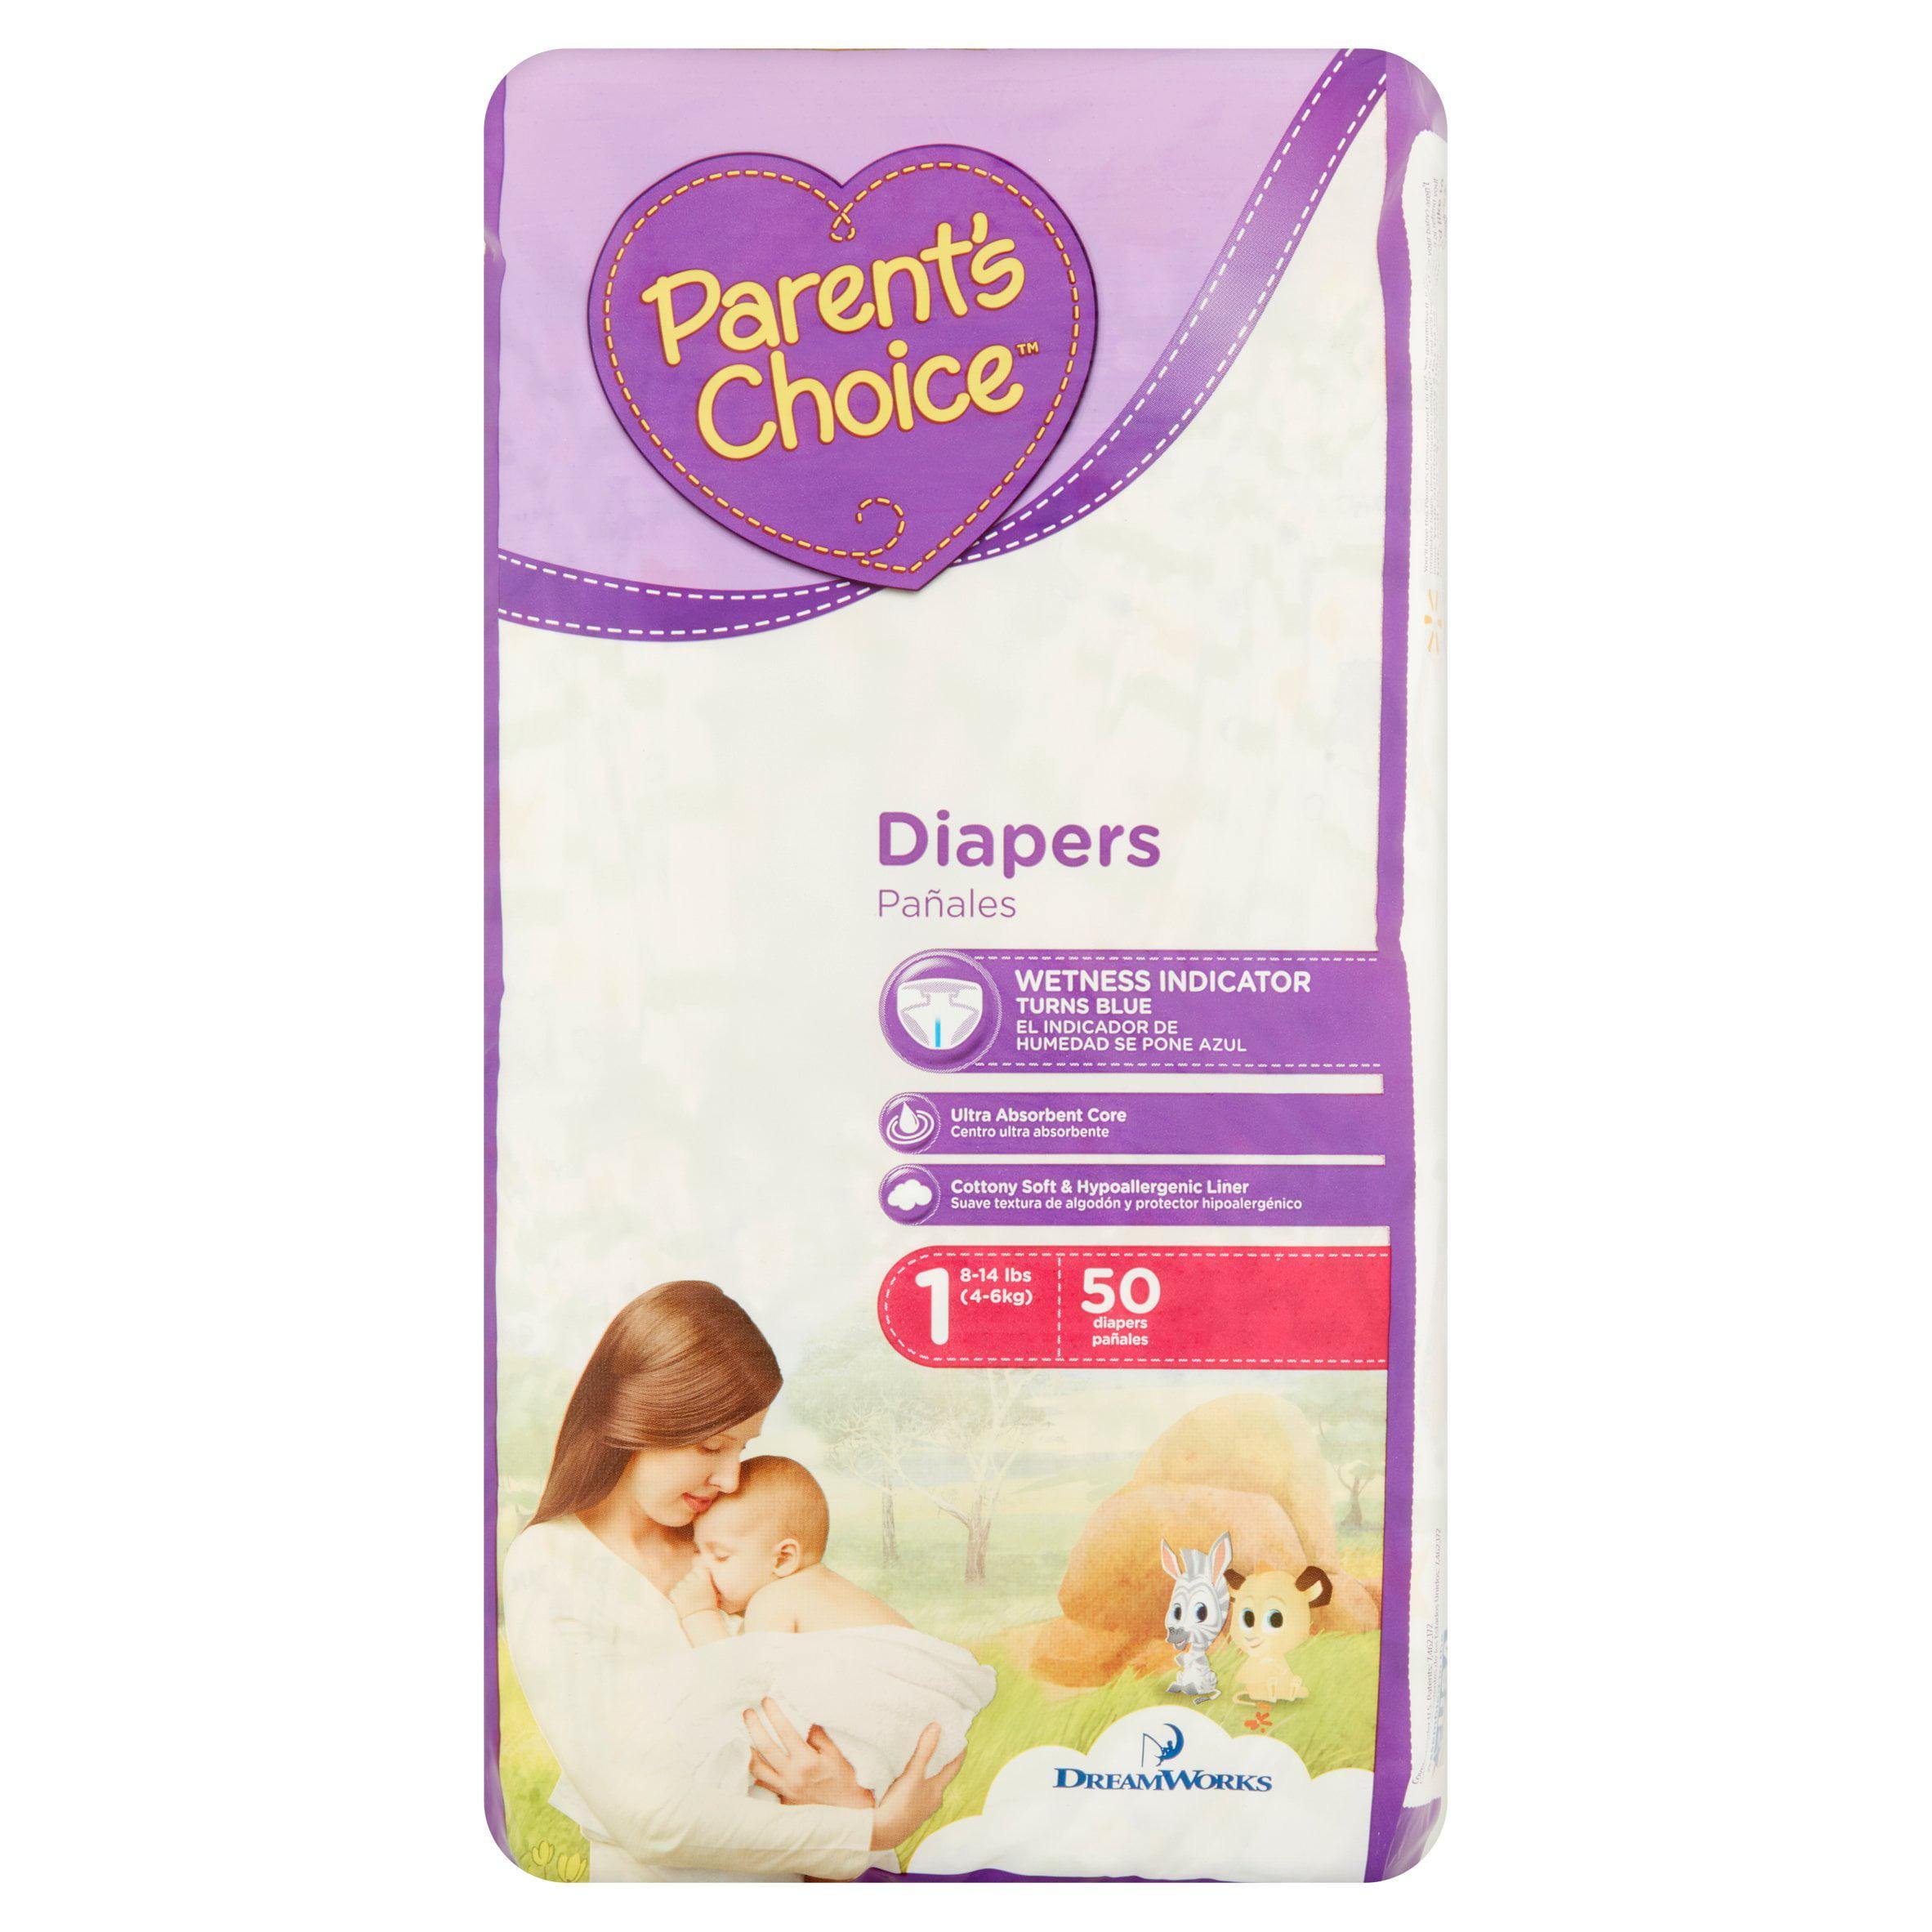 Parent's Choice Diapers, Size 1, 50 Diapers - Walmart.com